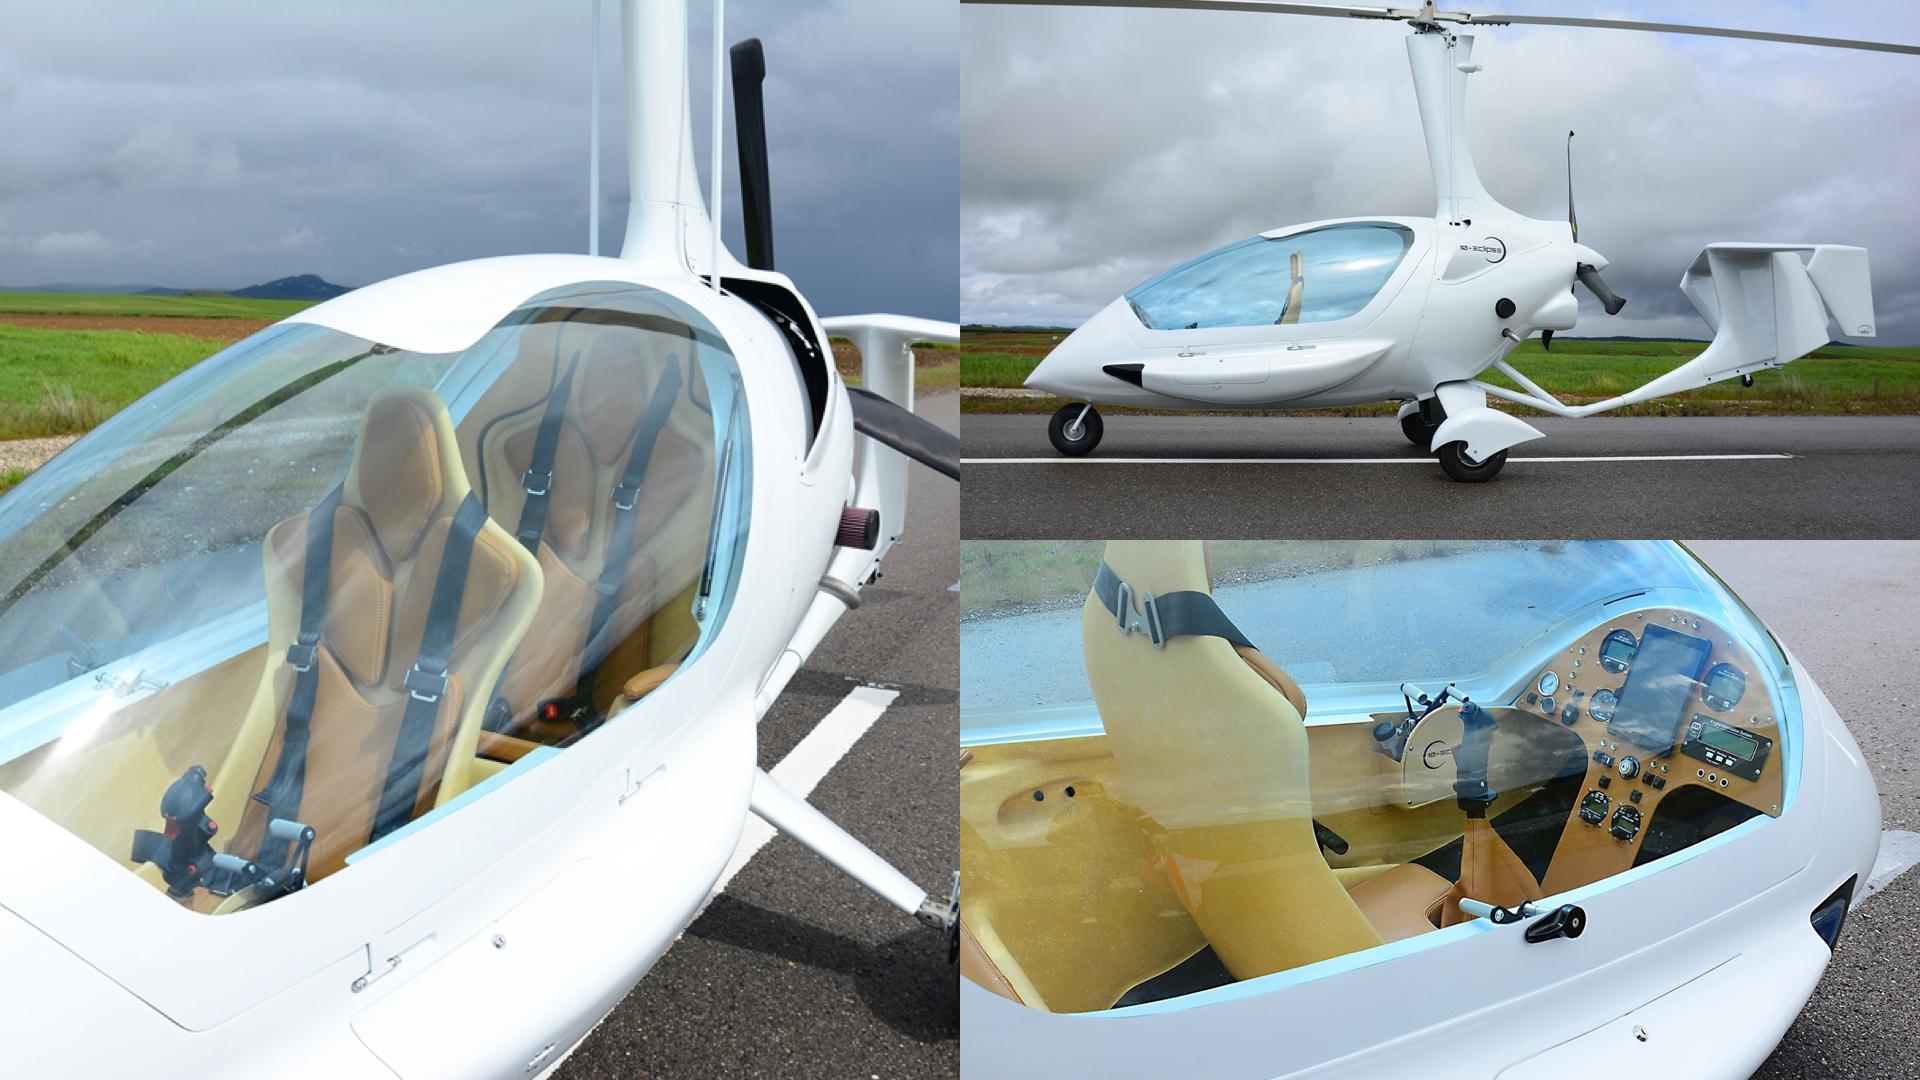 gyrocopter girodynamics ela 10 eclipse images